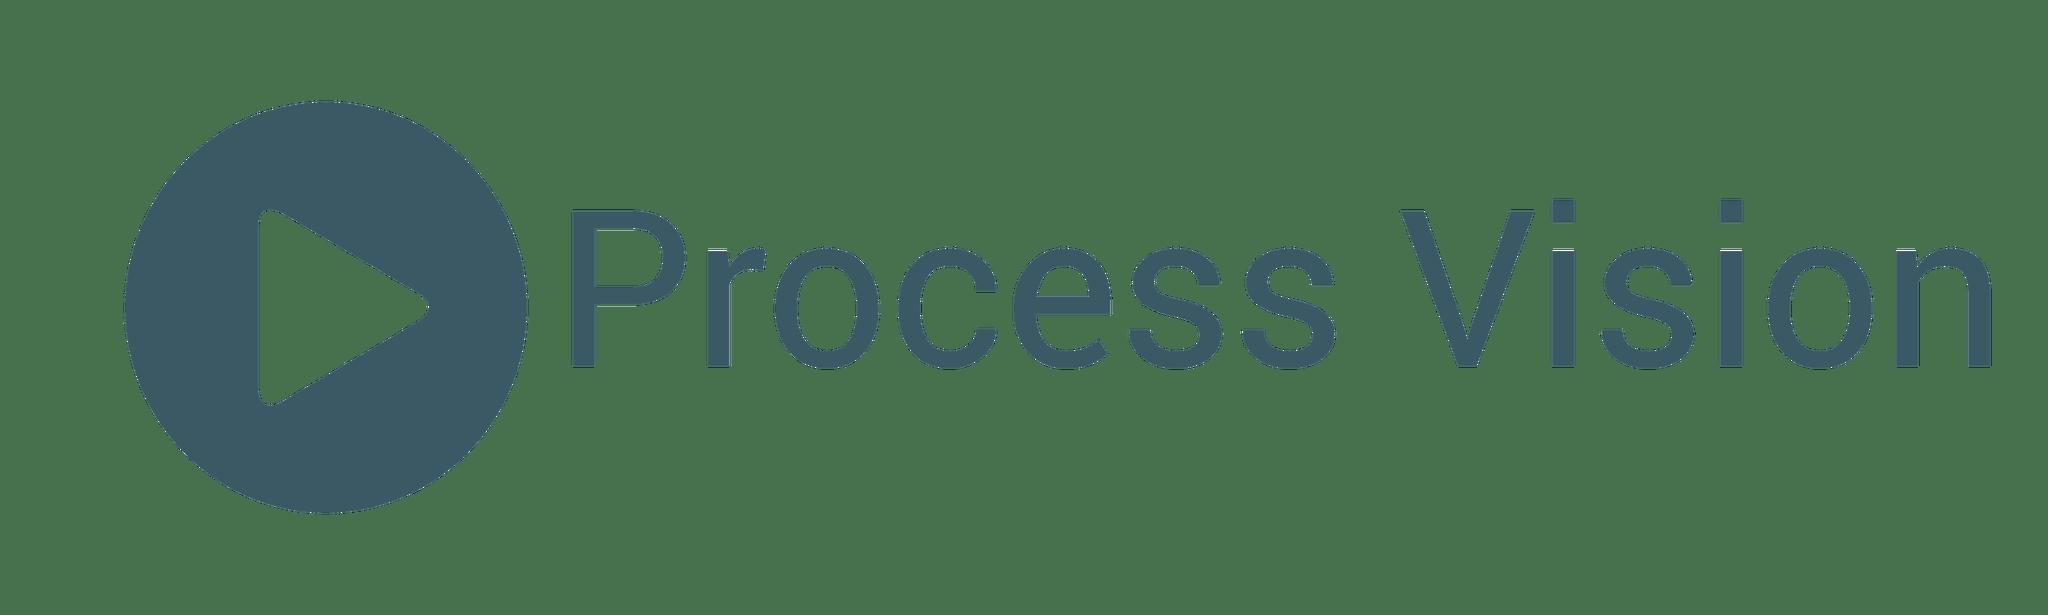 PROCESS VISION LTD.